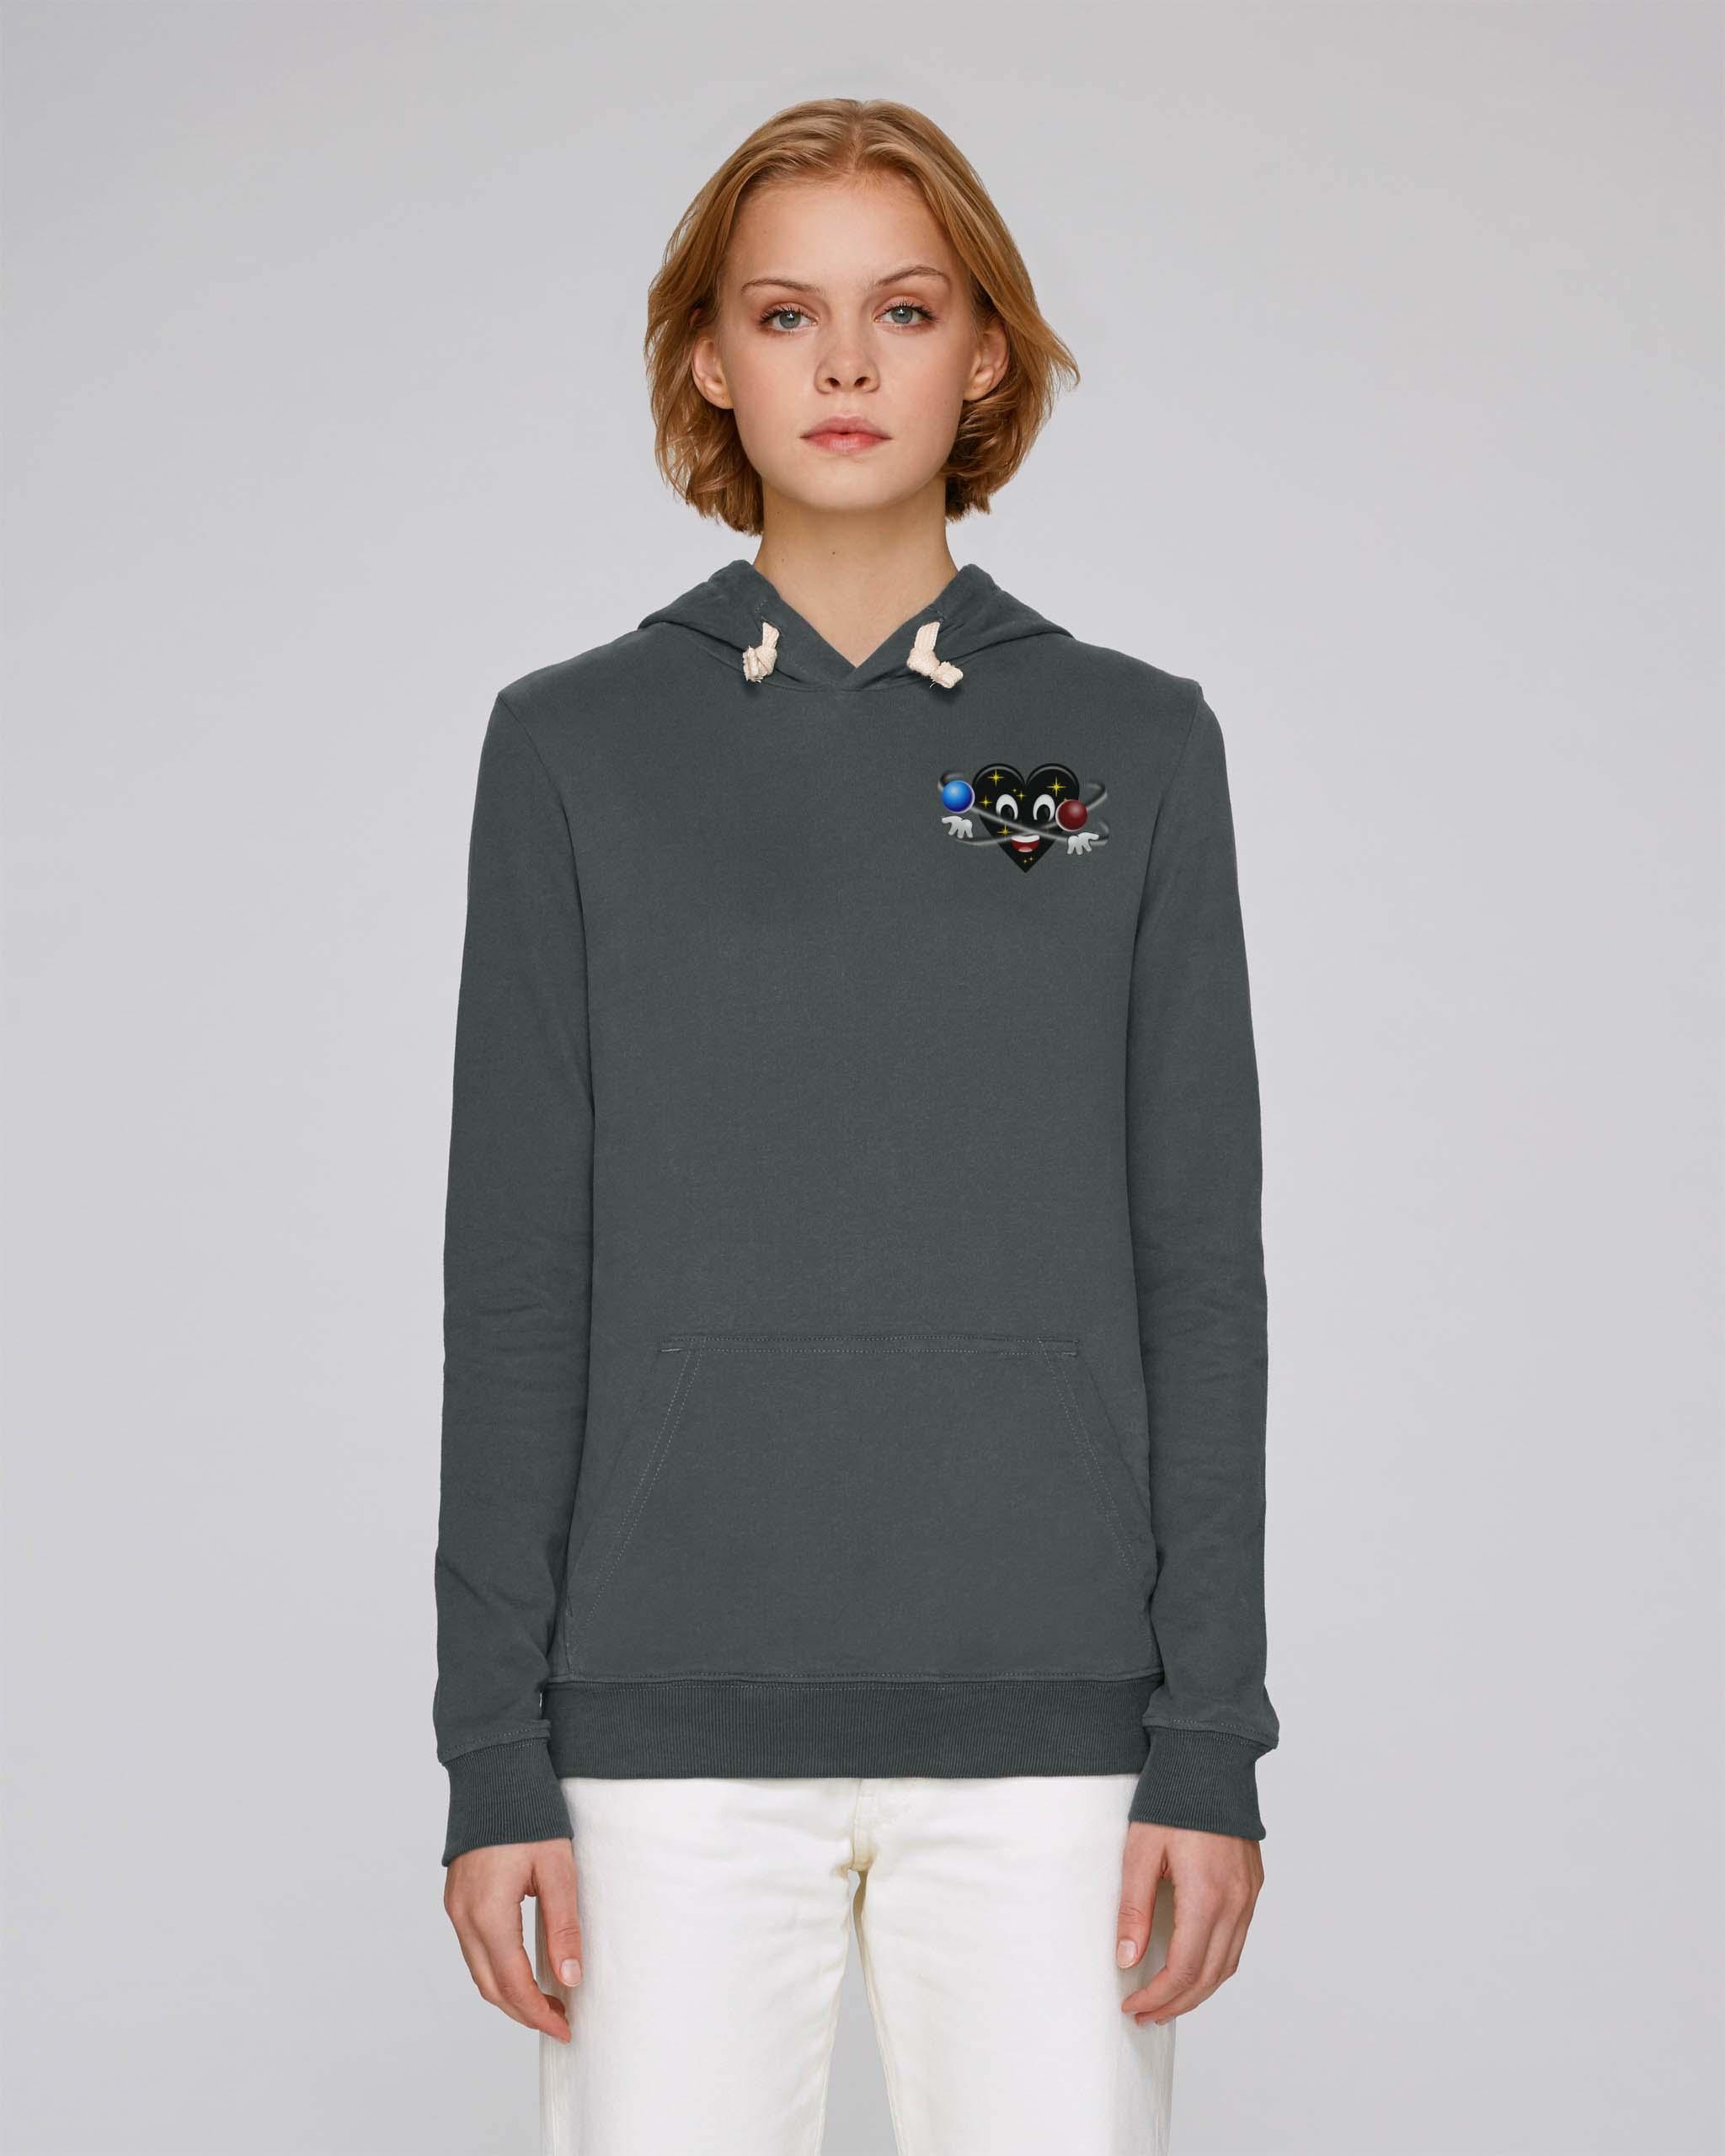 Sweat shirt a capuche bio uni gris femme - Universe hoodie